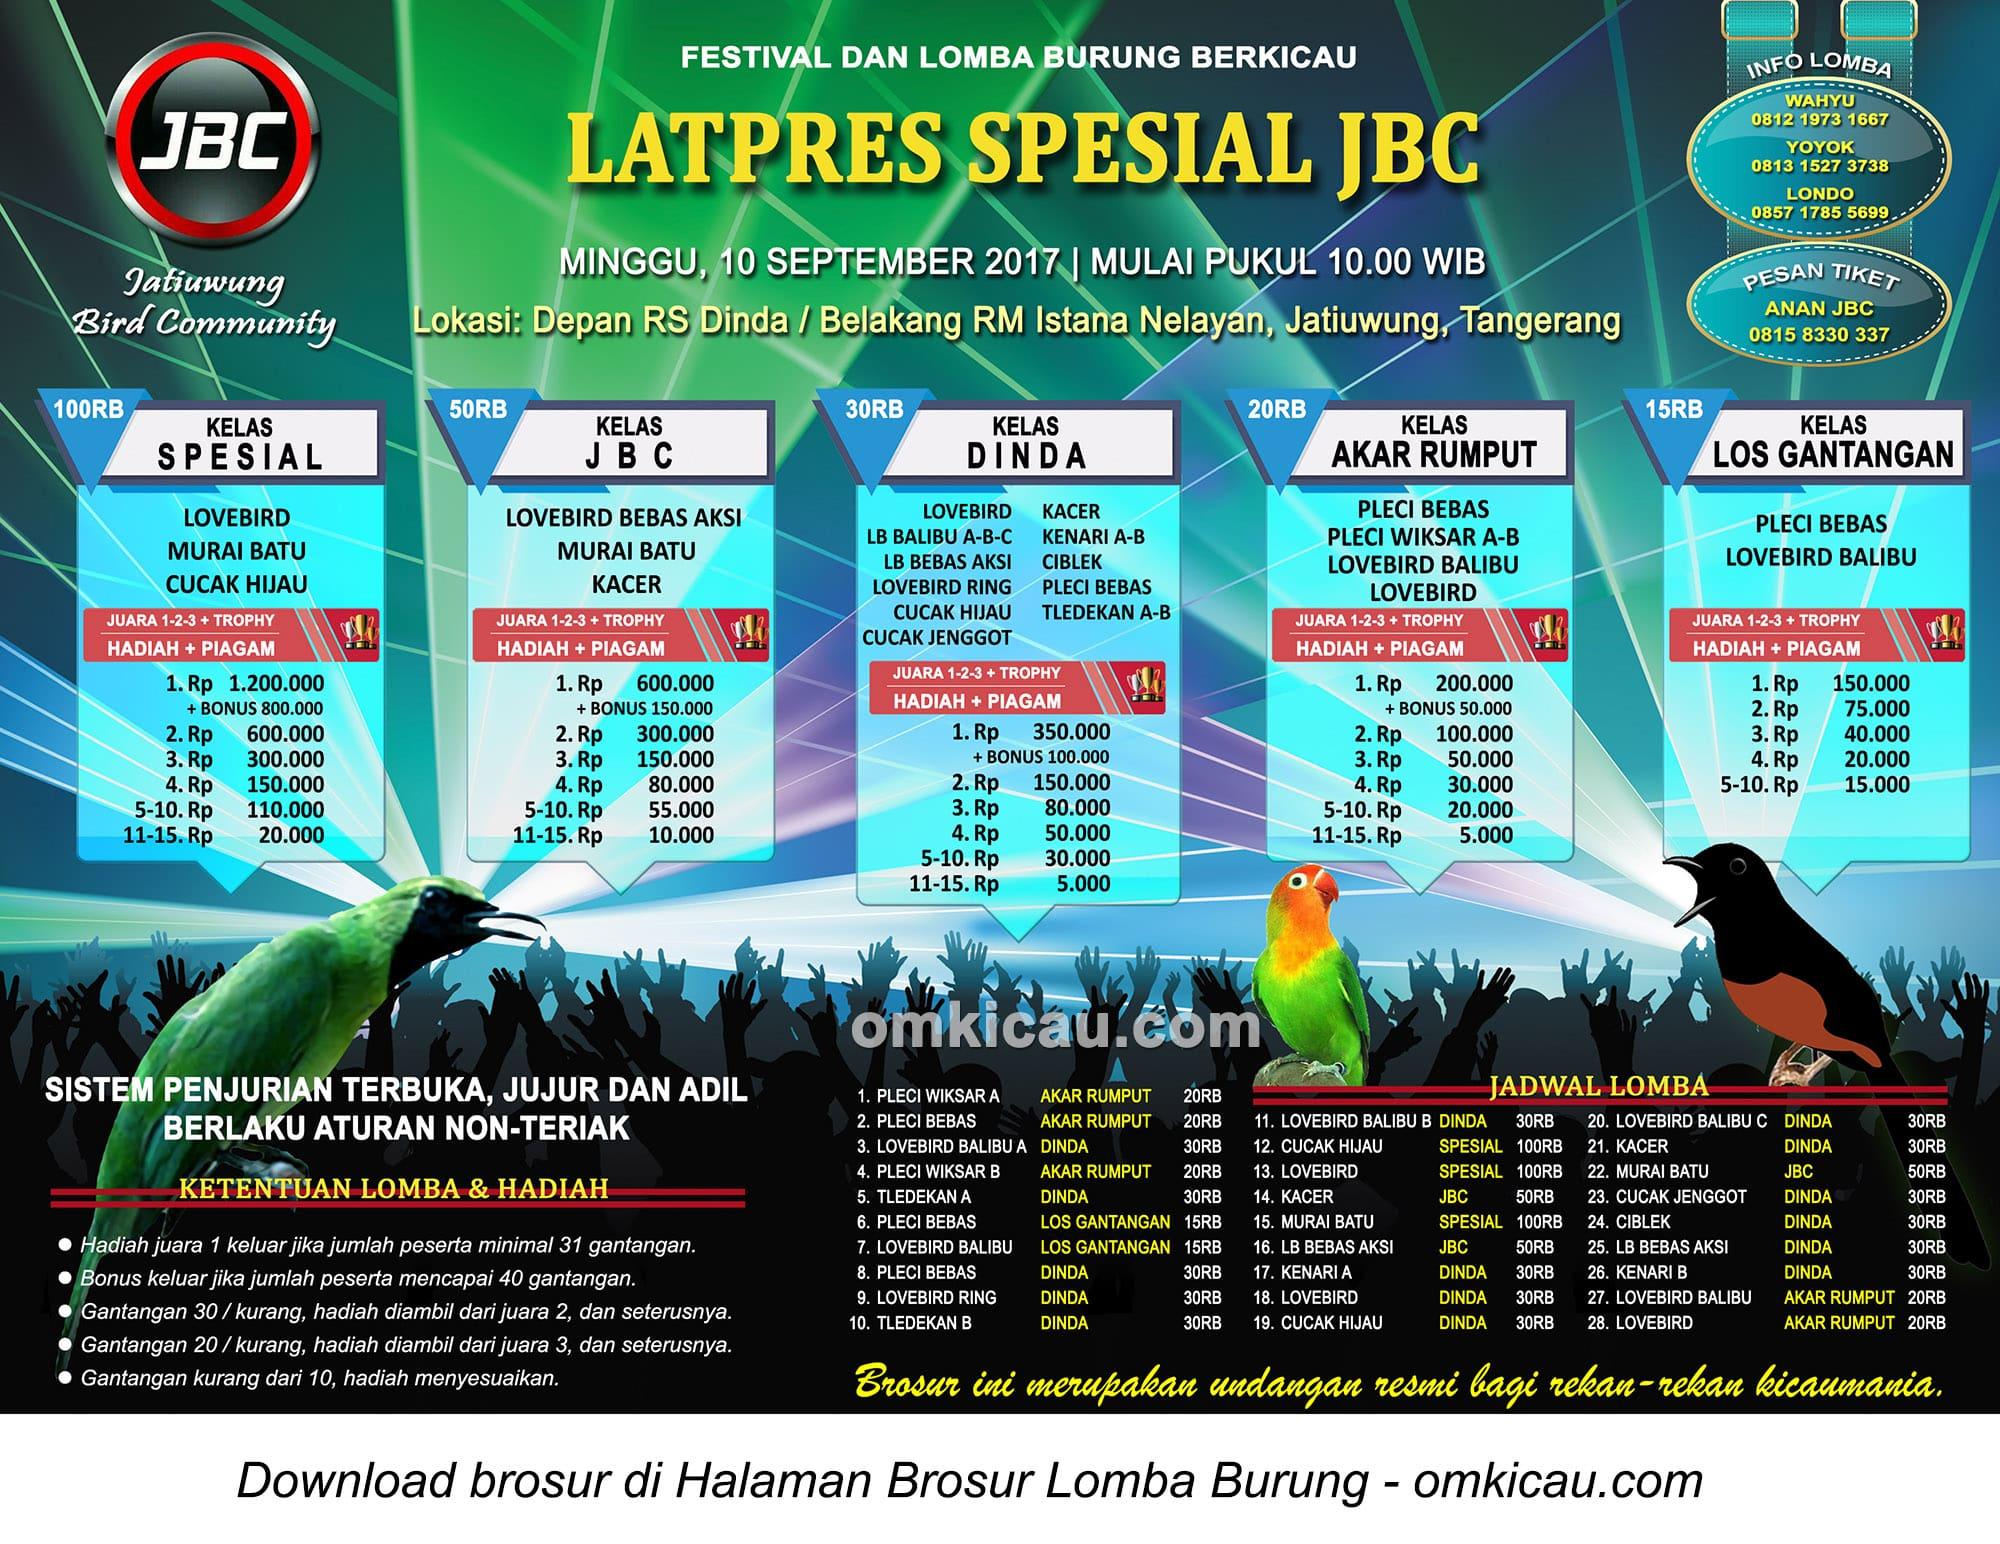 Latpres Spesial JBC Tangerang